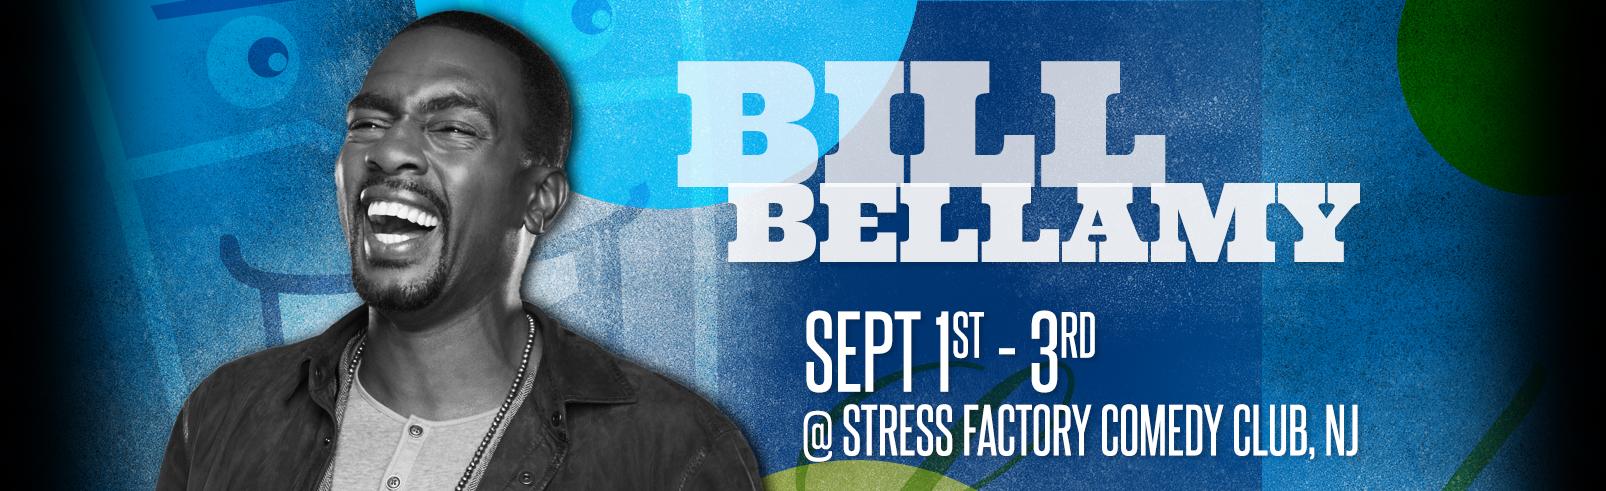 Bill Bellamy @ Stress Factory Comedy Club